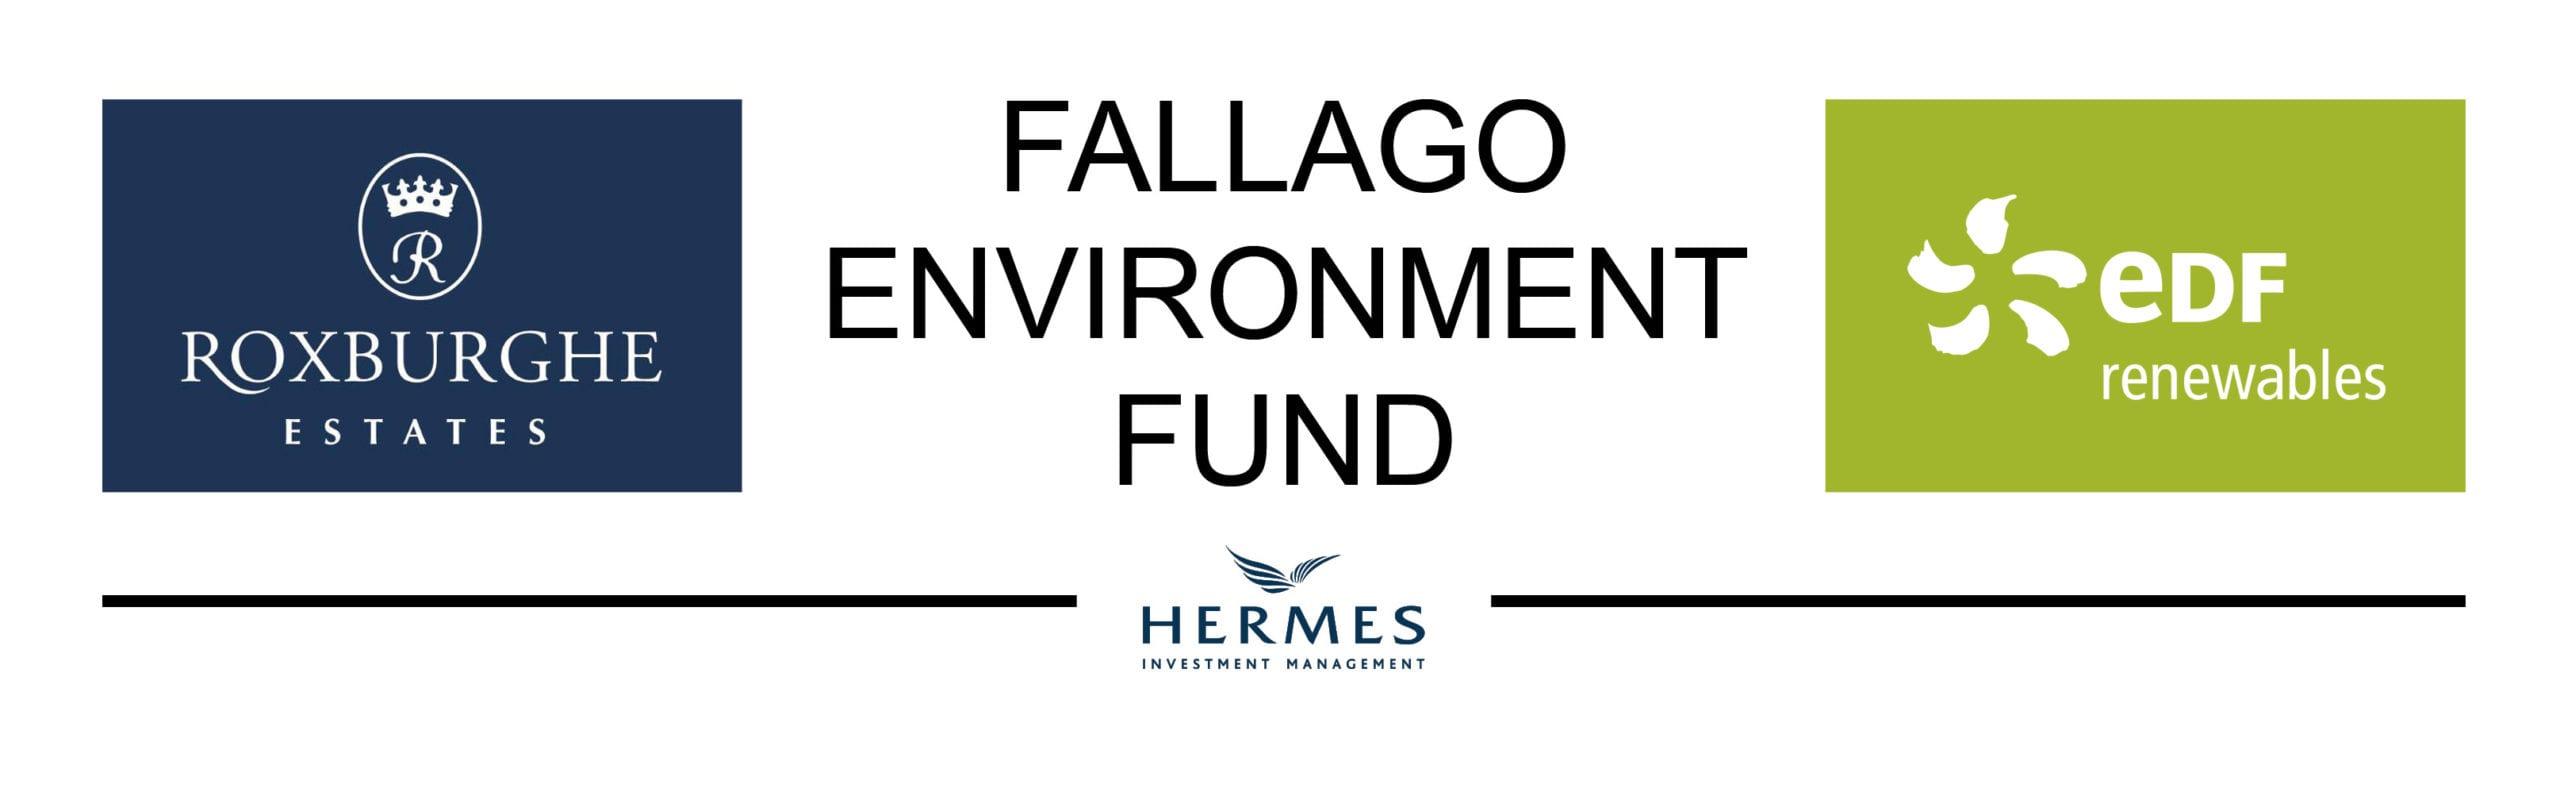 Fallago Environment Fund